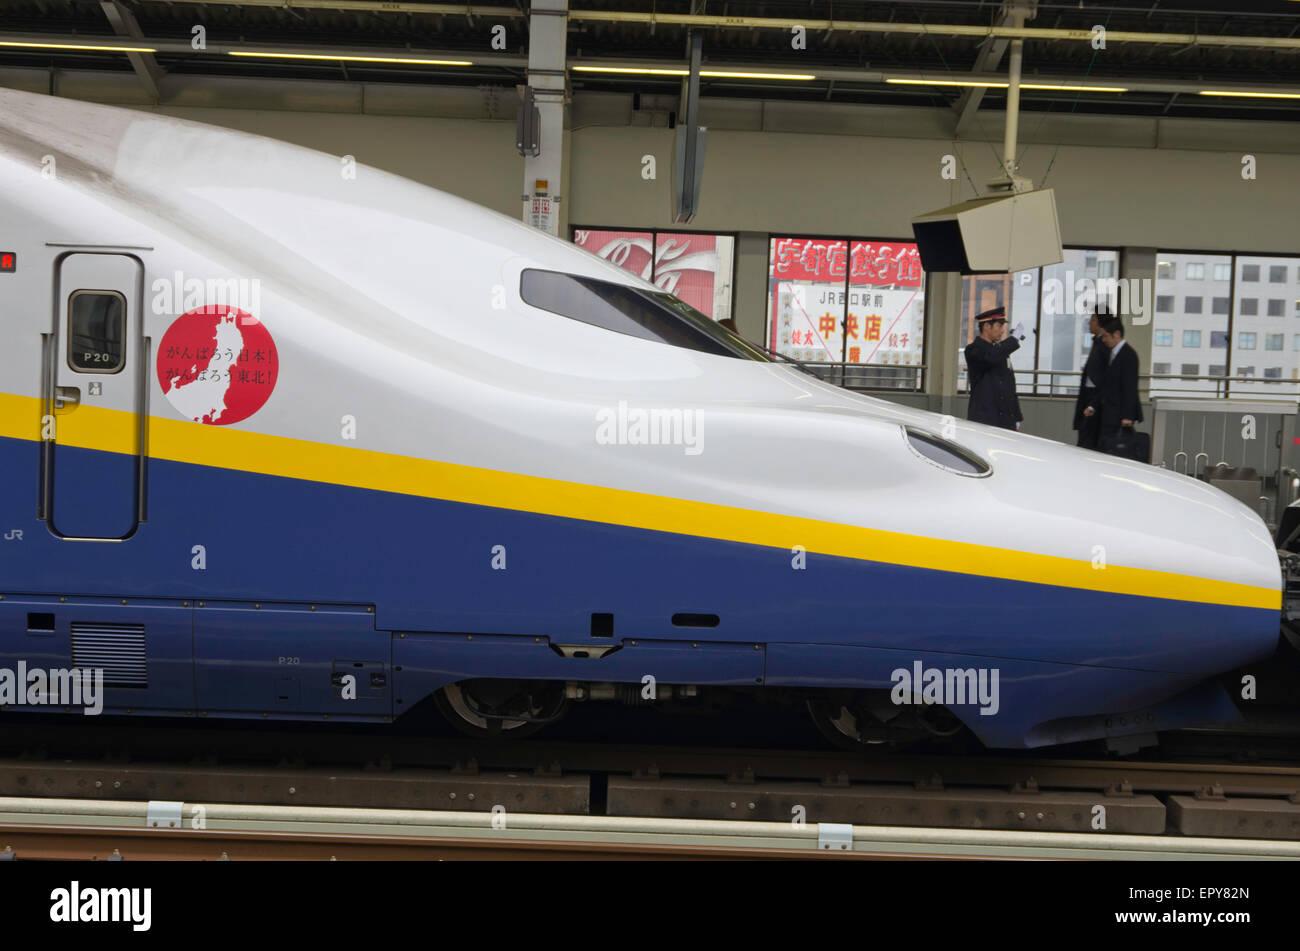 Japanese Bullet Train Stock Photos Amp Japanese Bullet Train